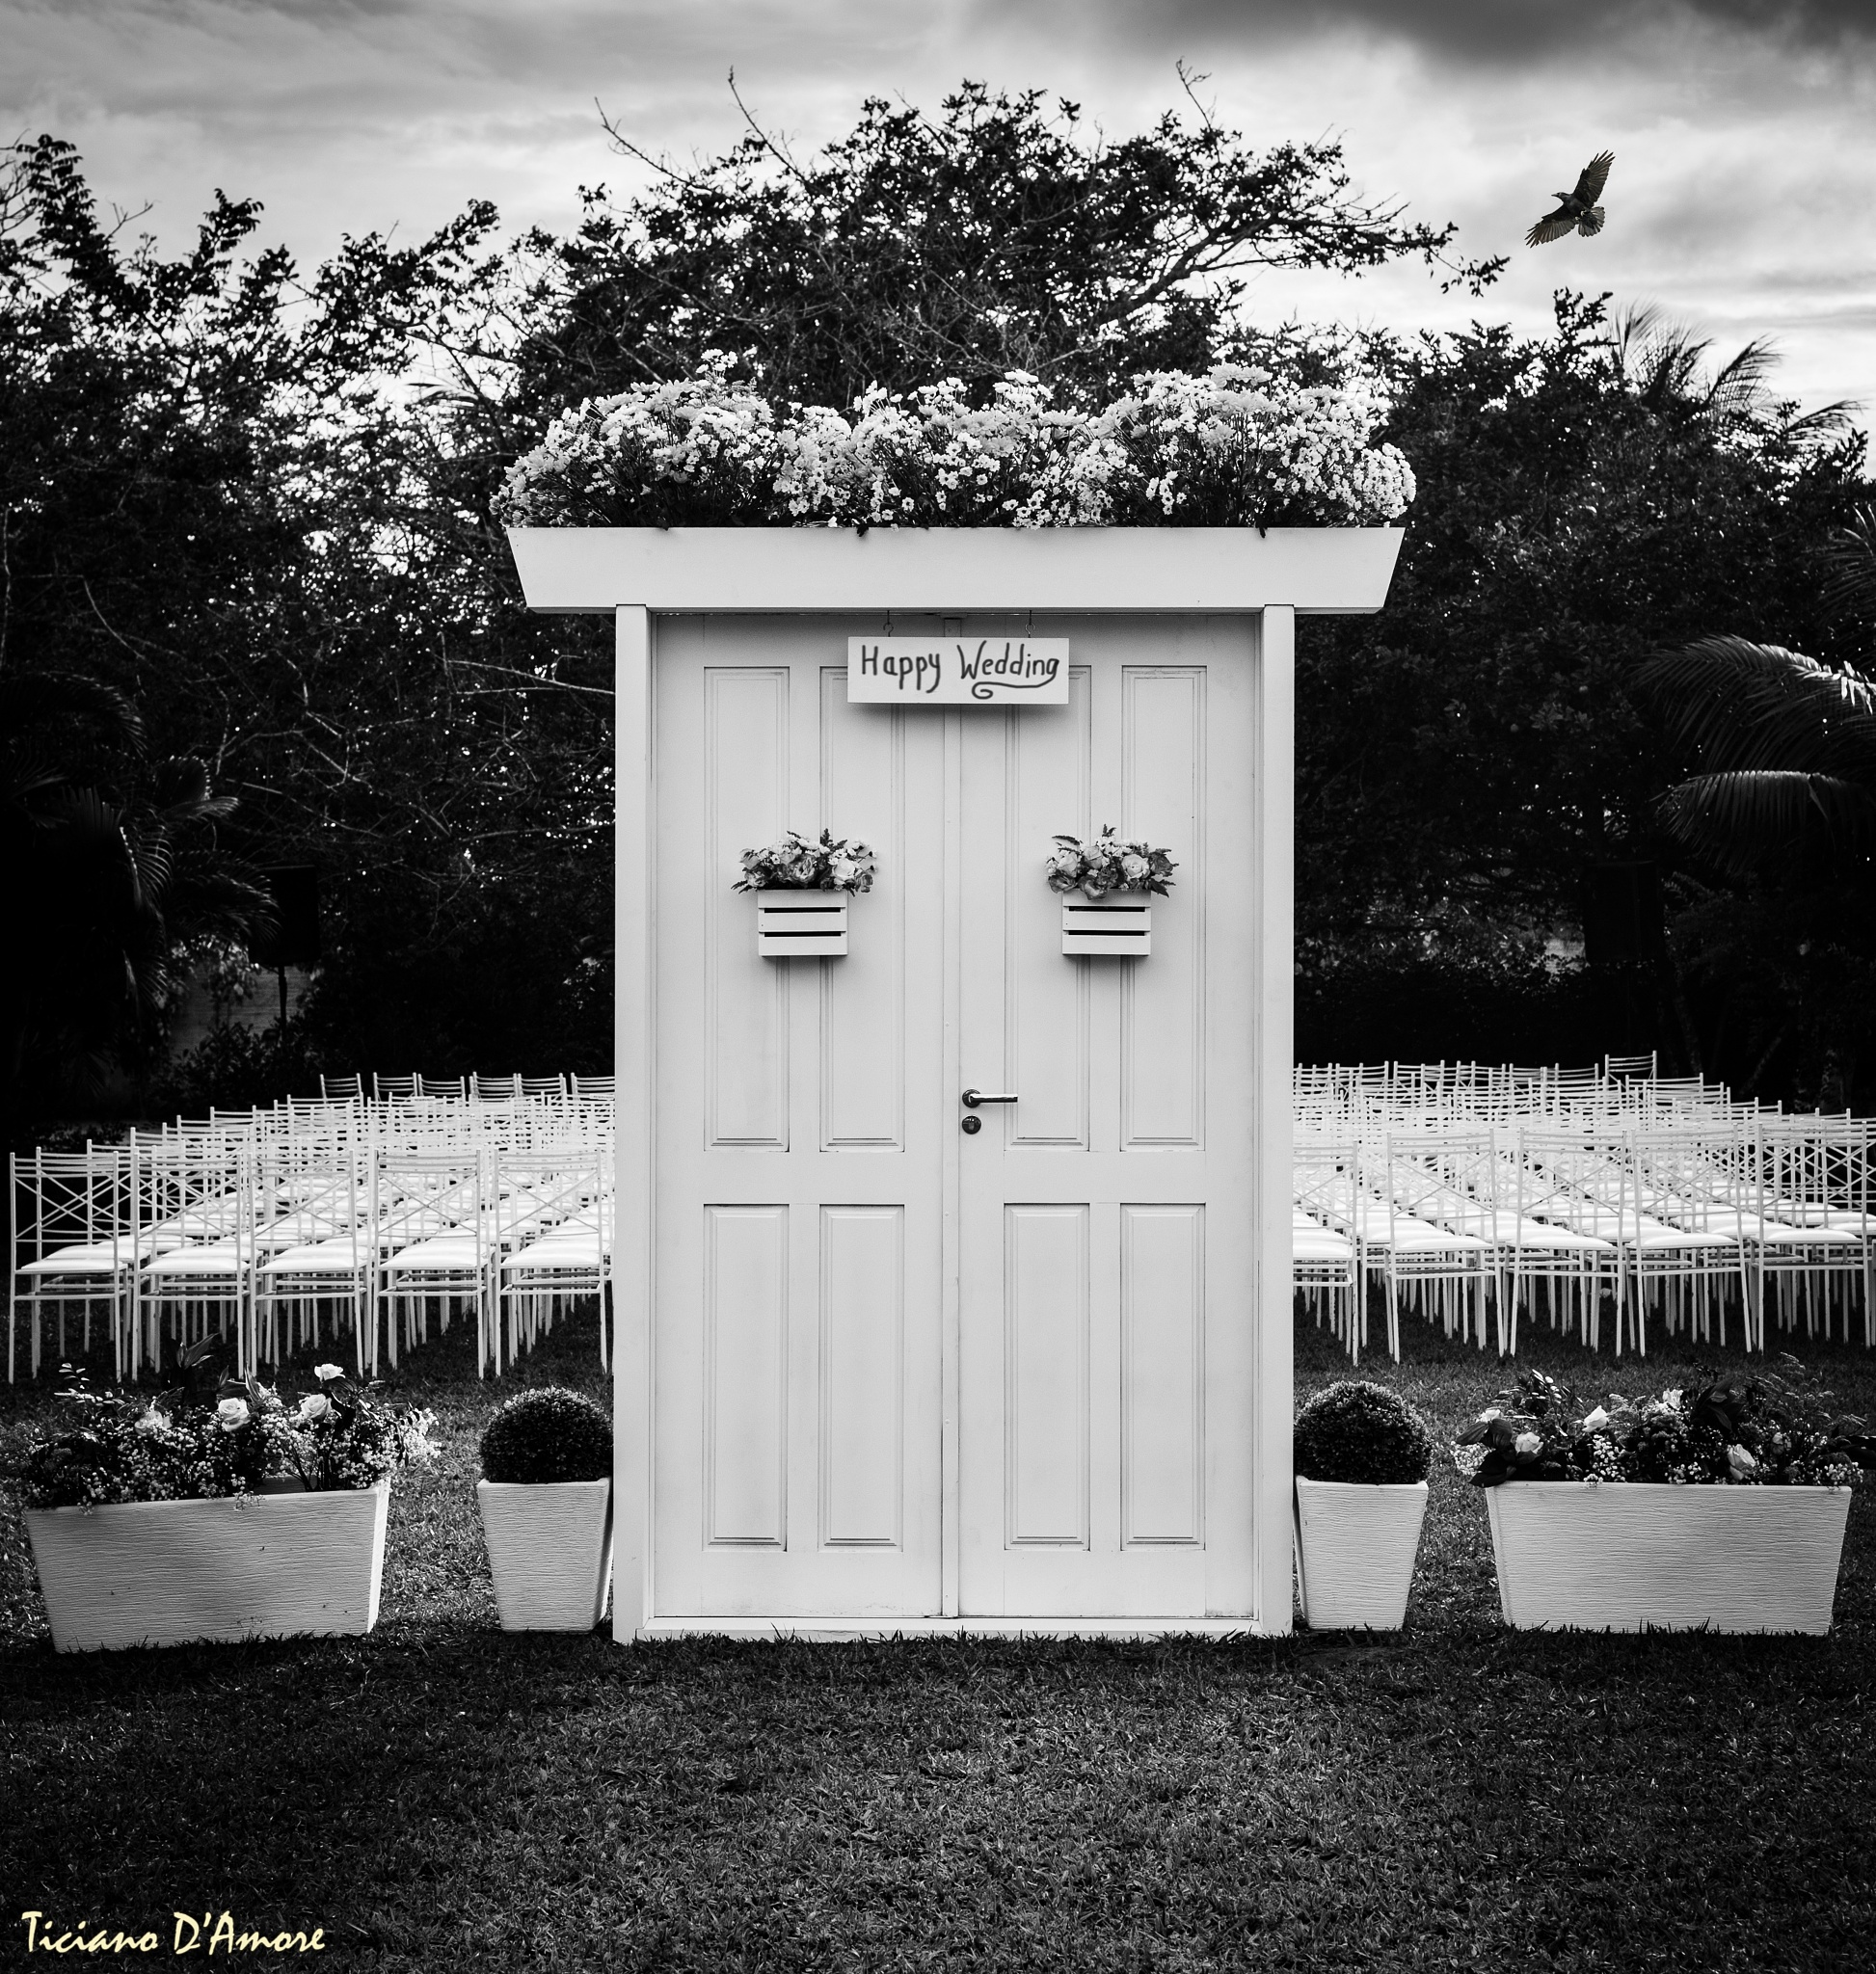 Cursed Wedding by damoreticiano